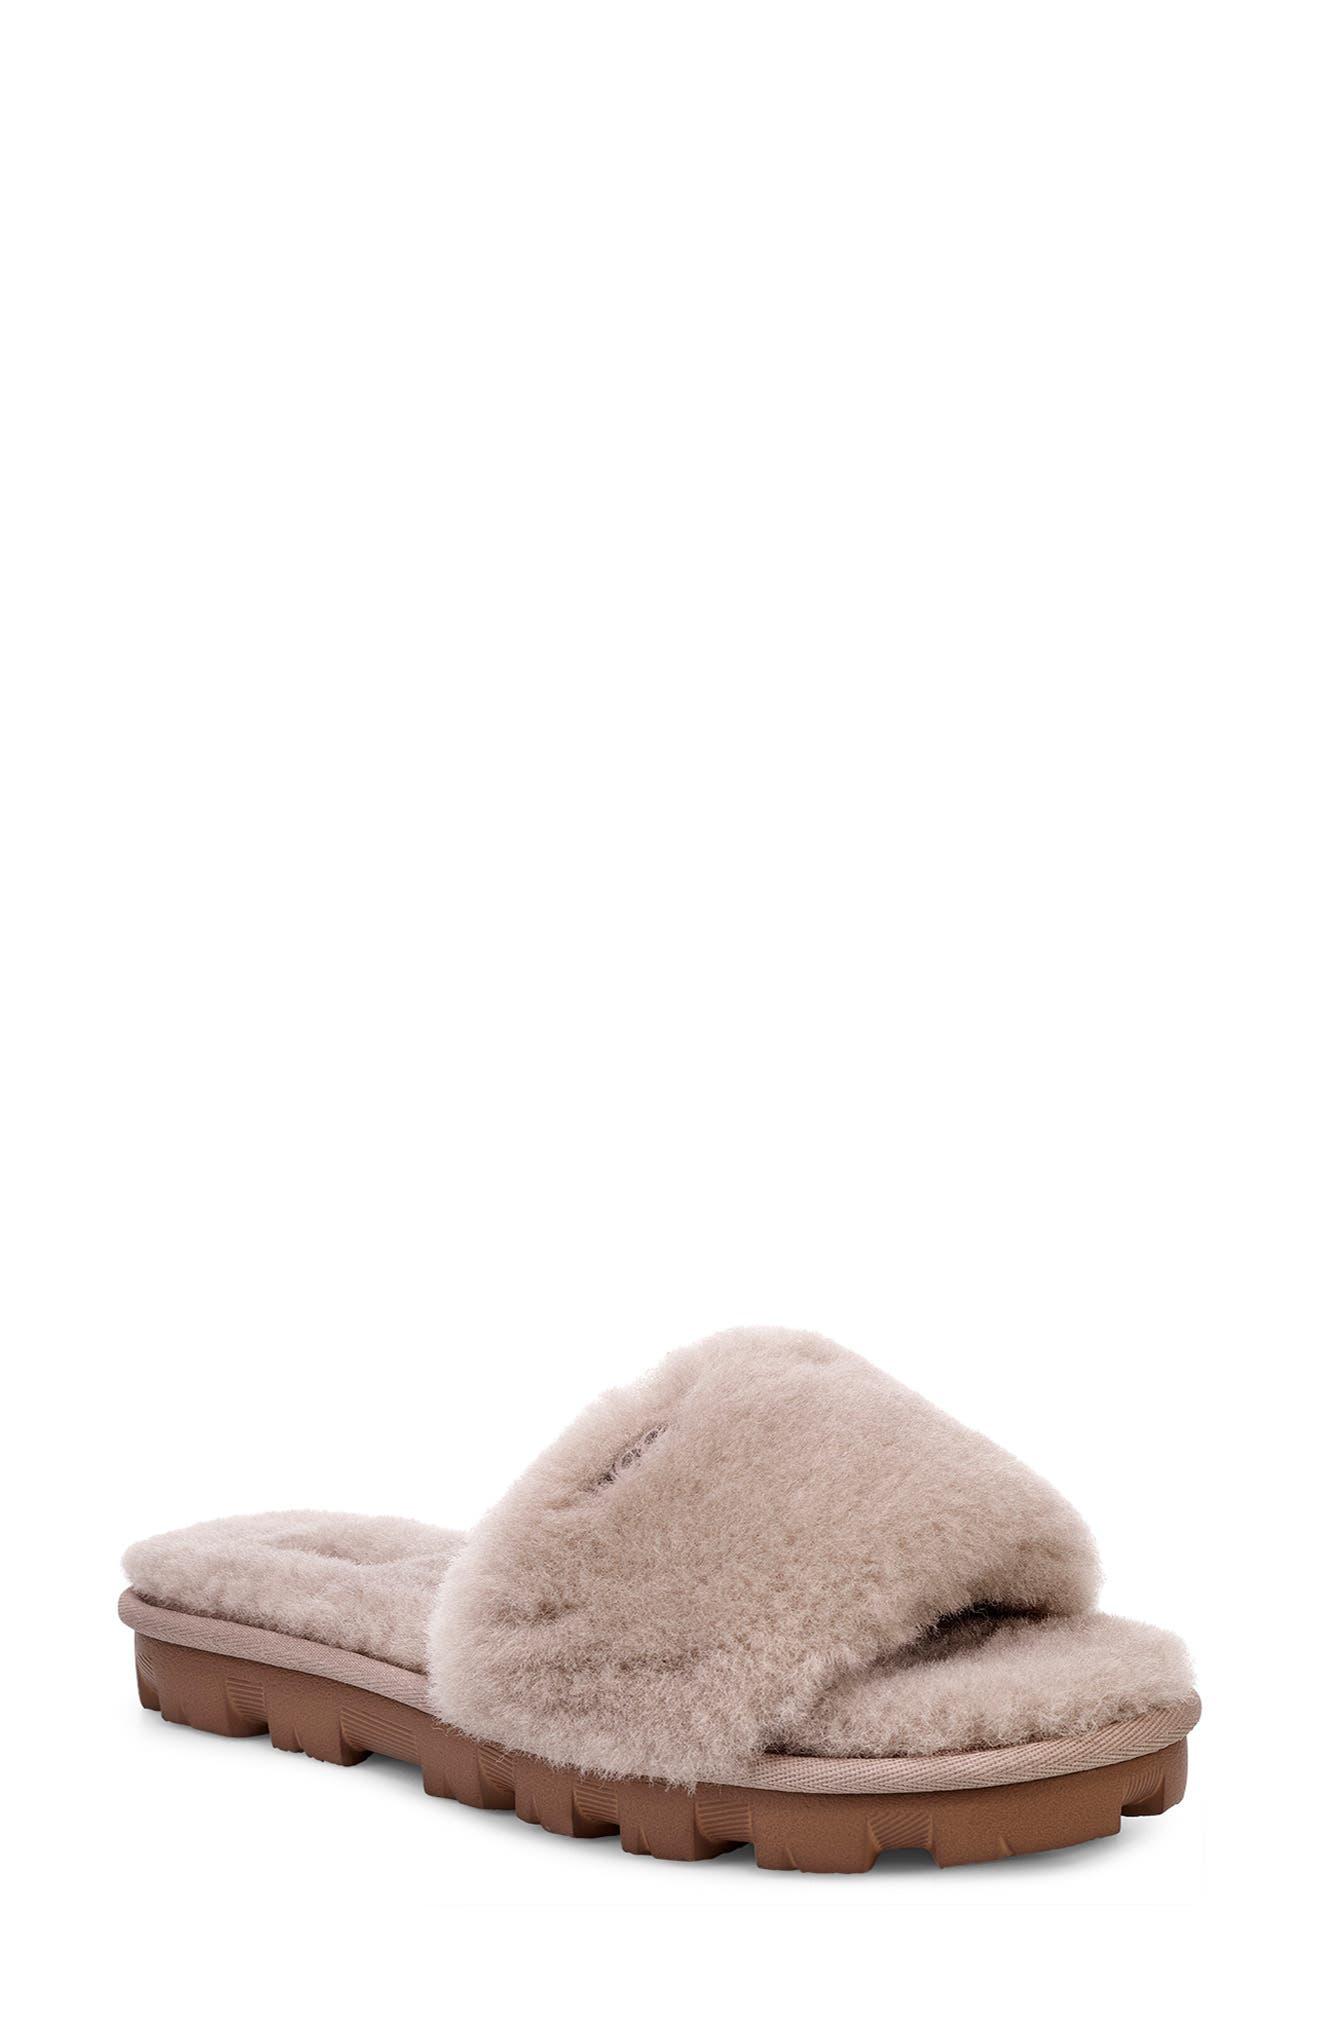 Ugg Cosette Genuine Shearling Slipper, Grey